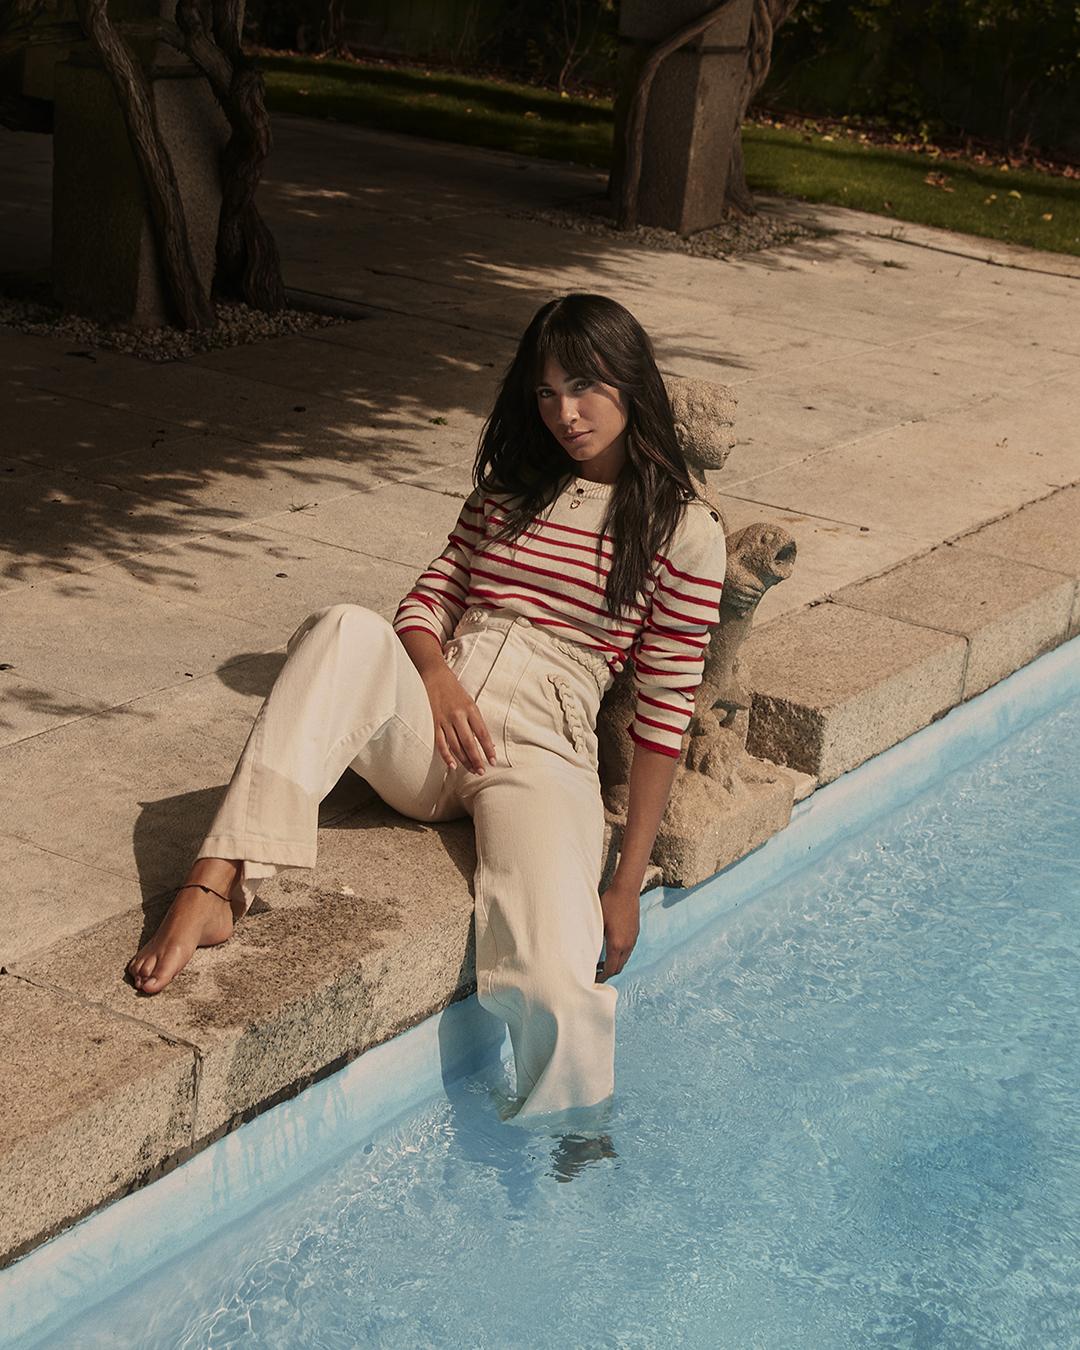 Aitana - Elle Spain - Editoral - Rafa Gallar - 8AM - 8 Artist Management